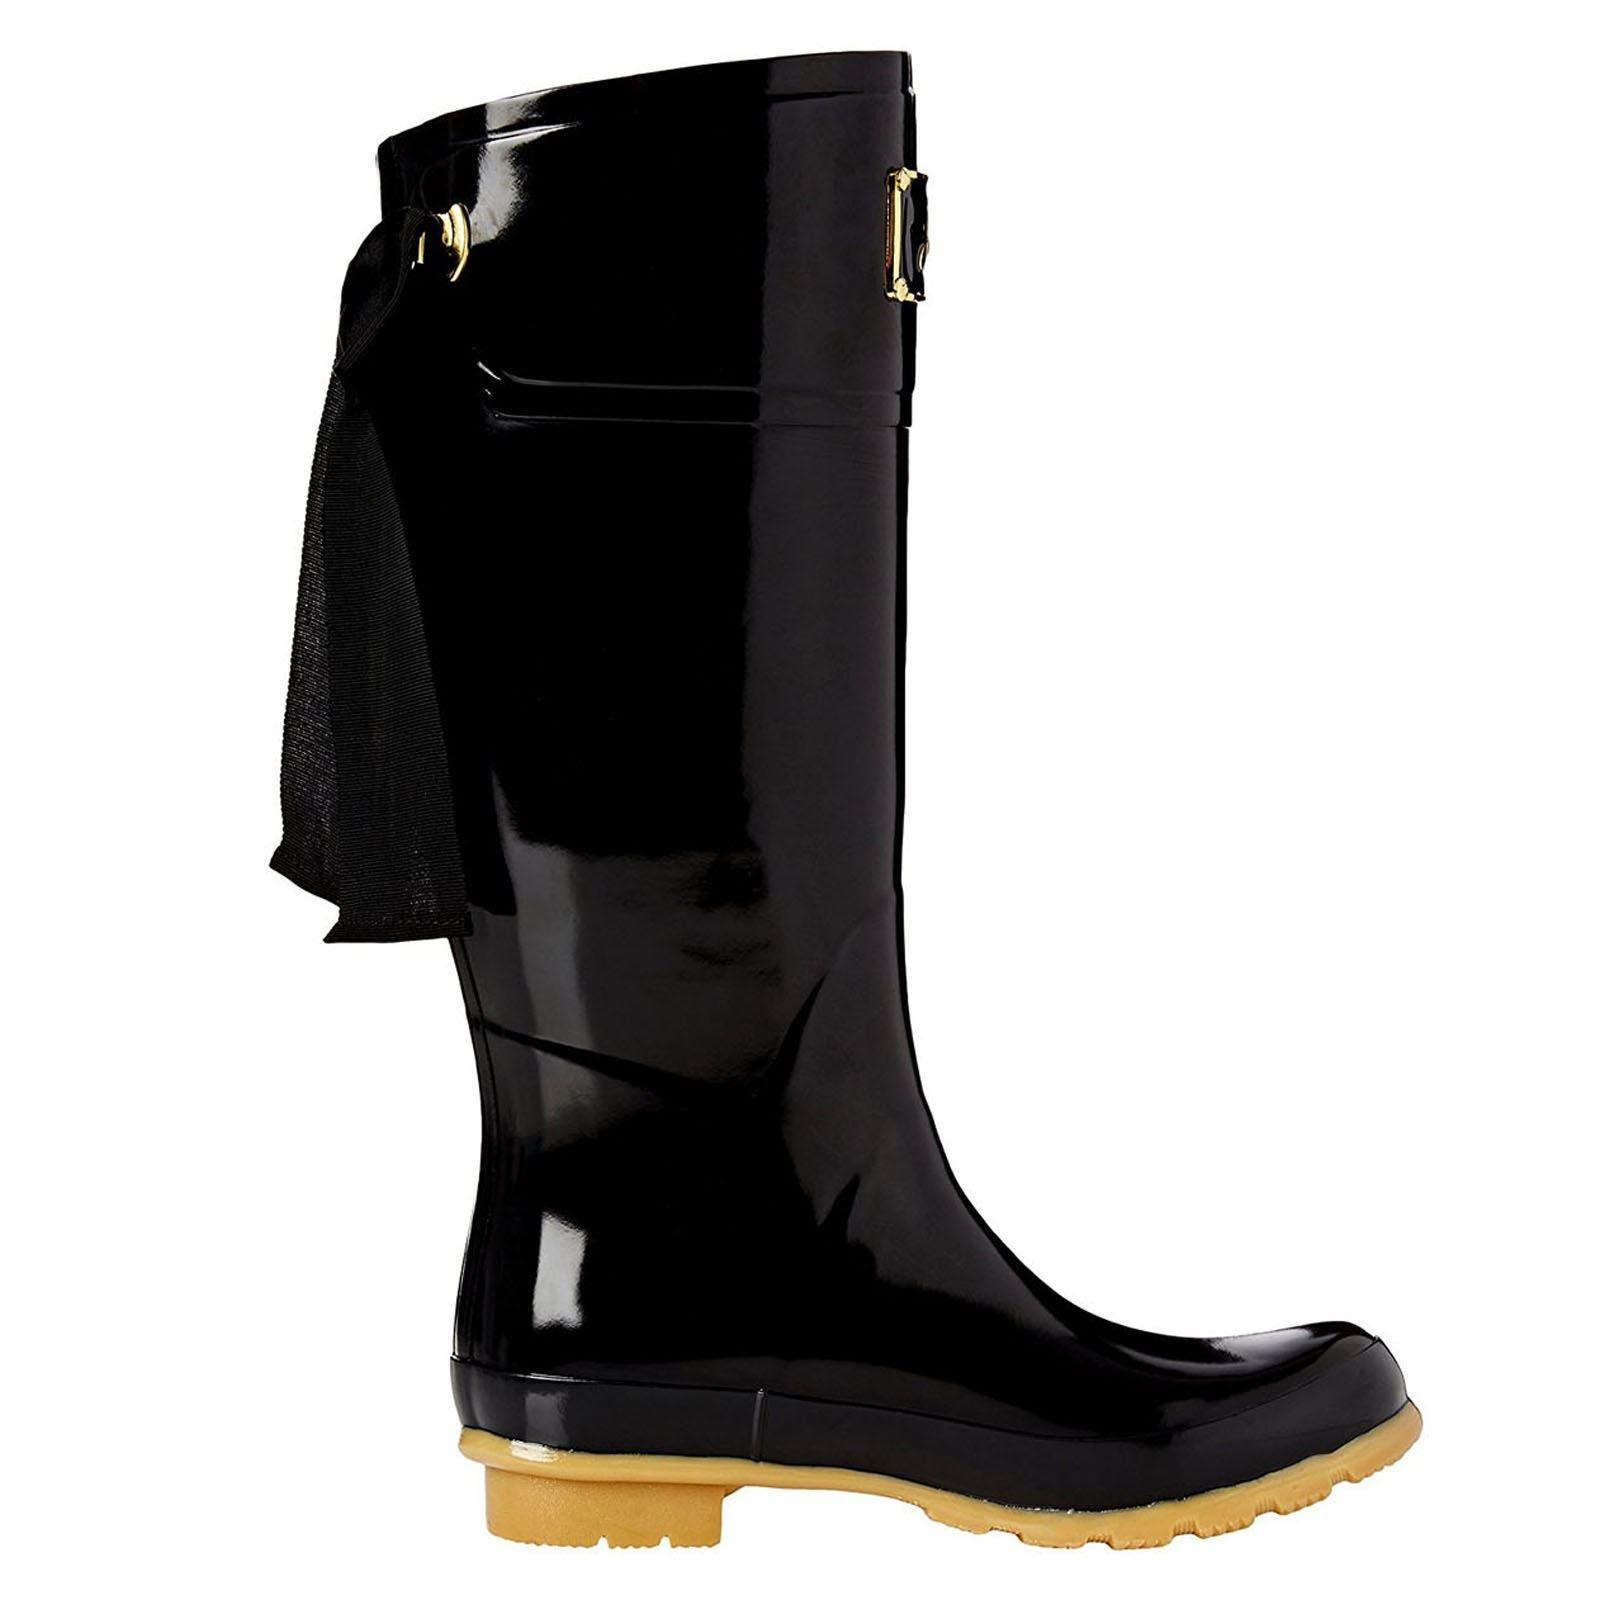 Joules Evedon Black Womens Rain Boots Size 9M